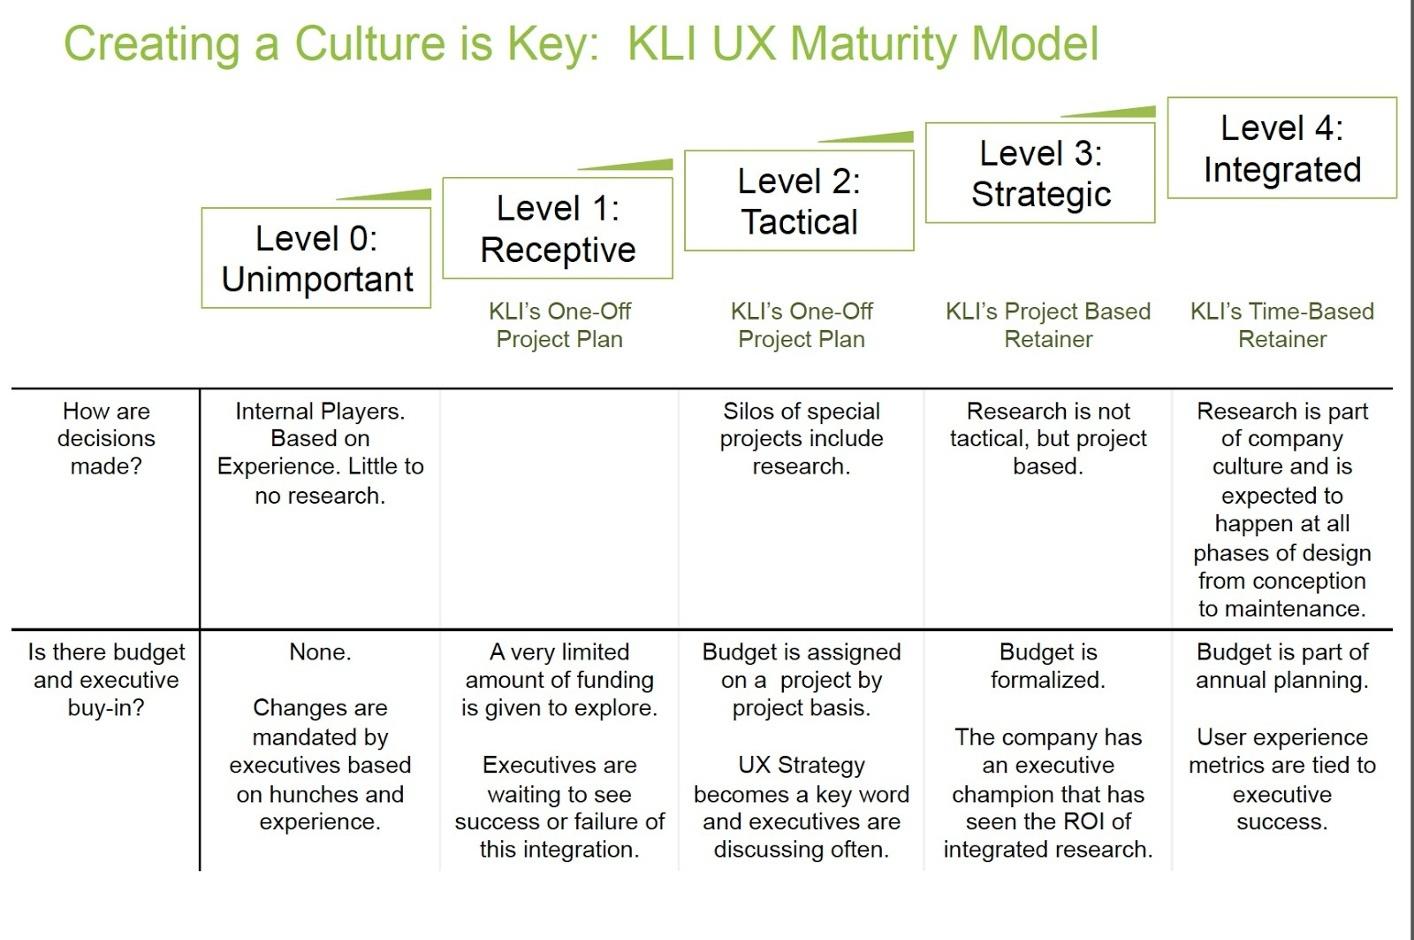 UX_Maturity_Model-1.jpg